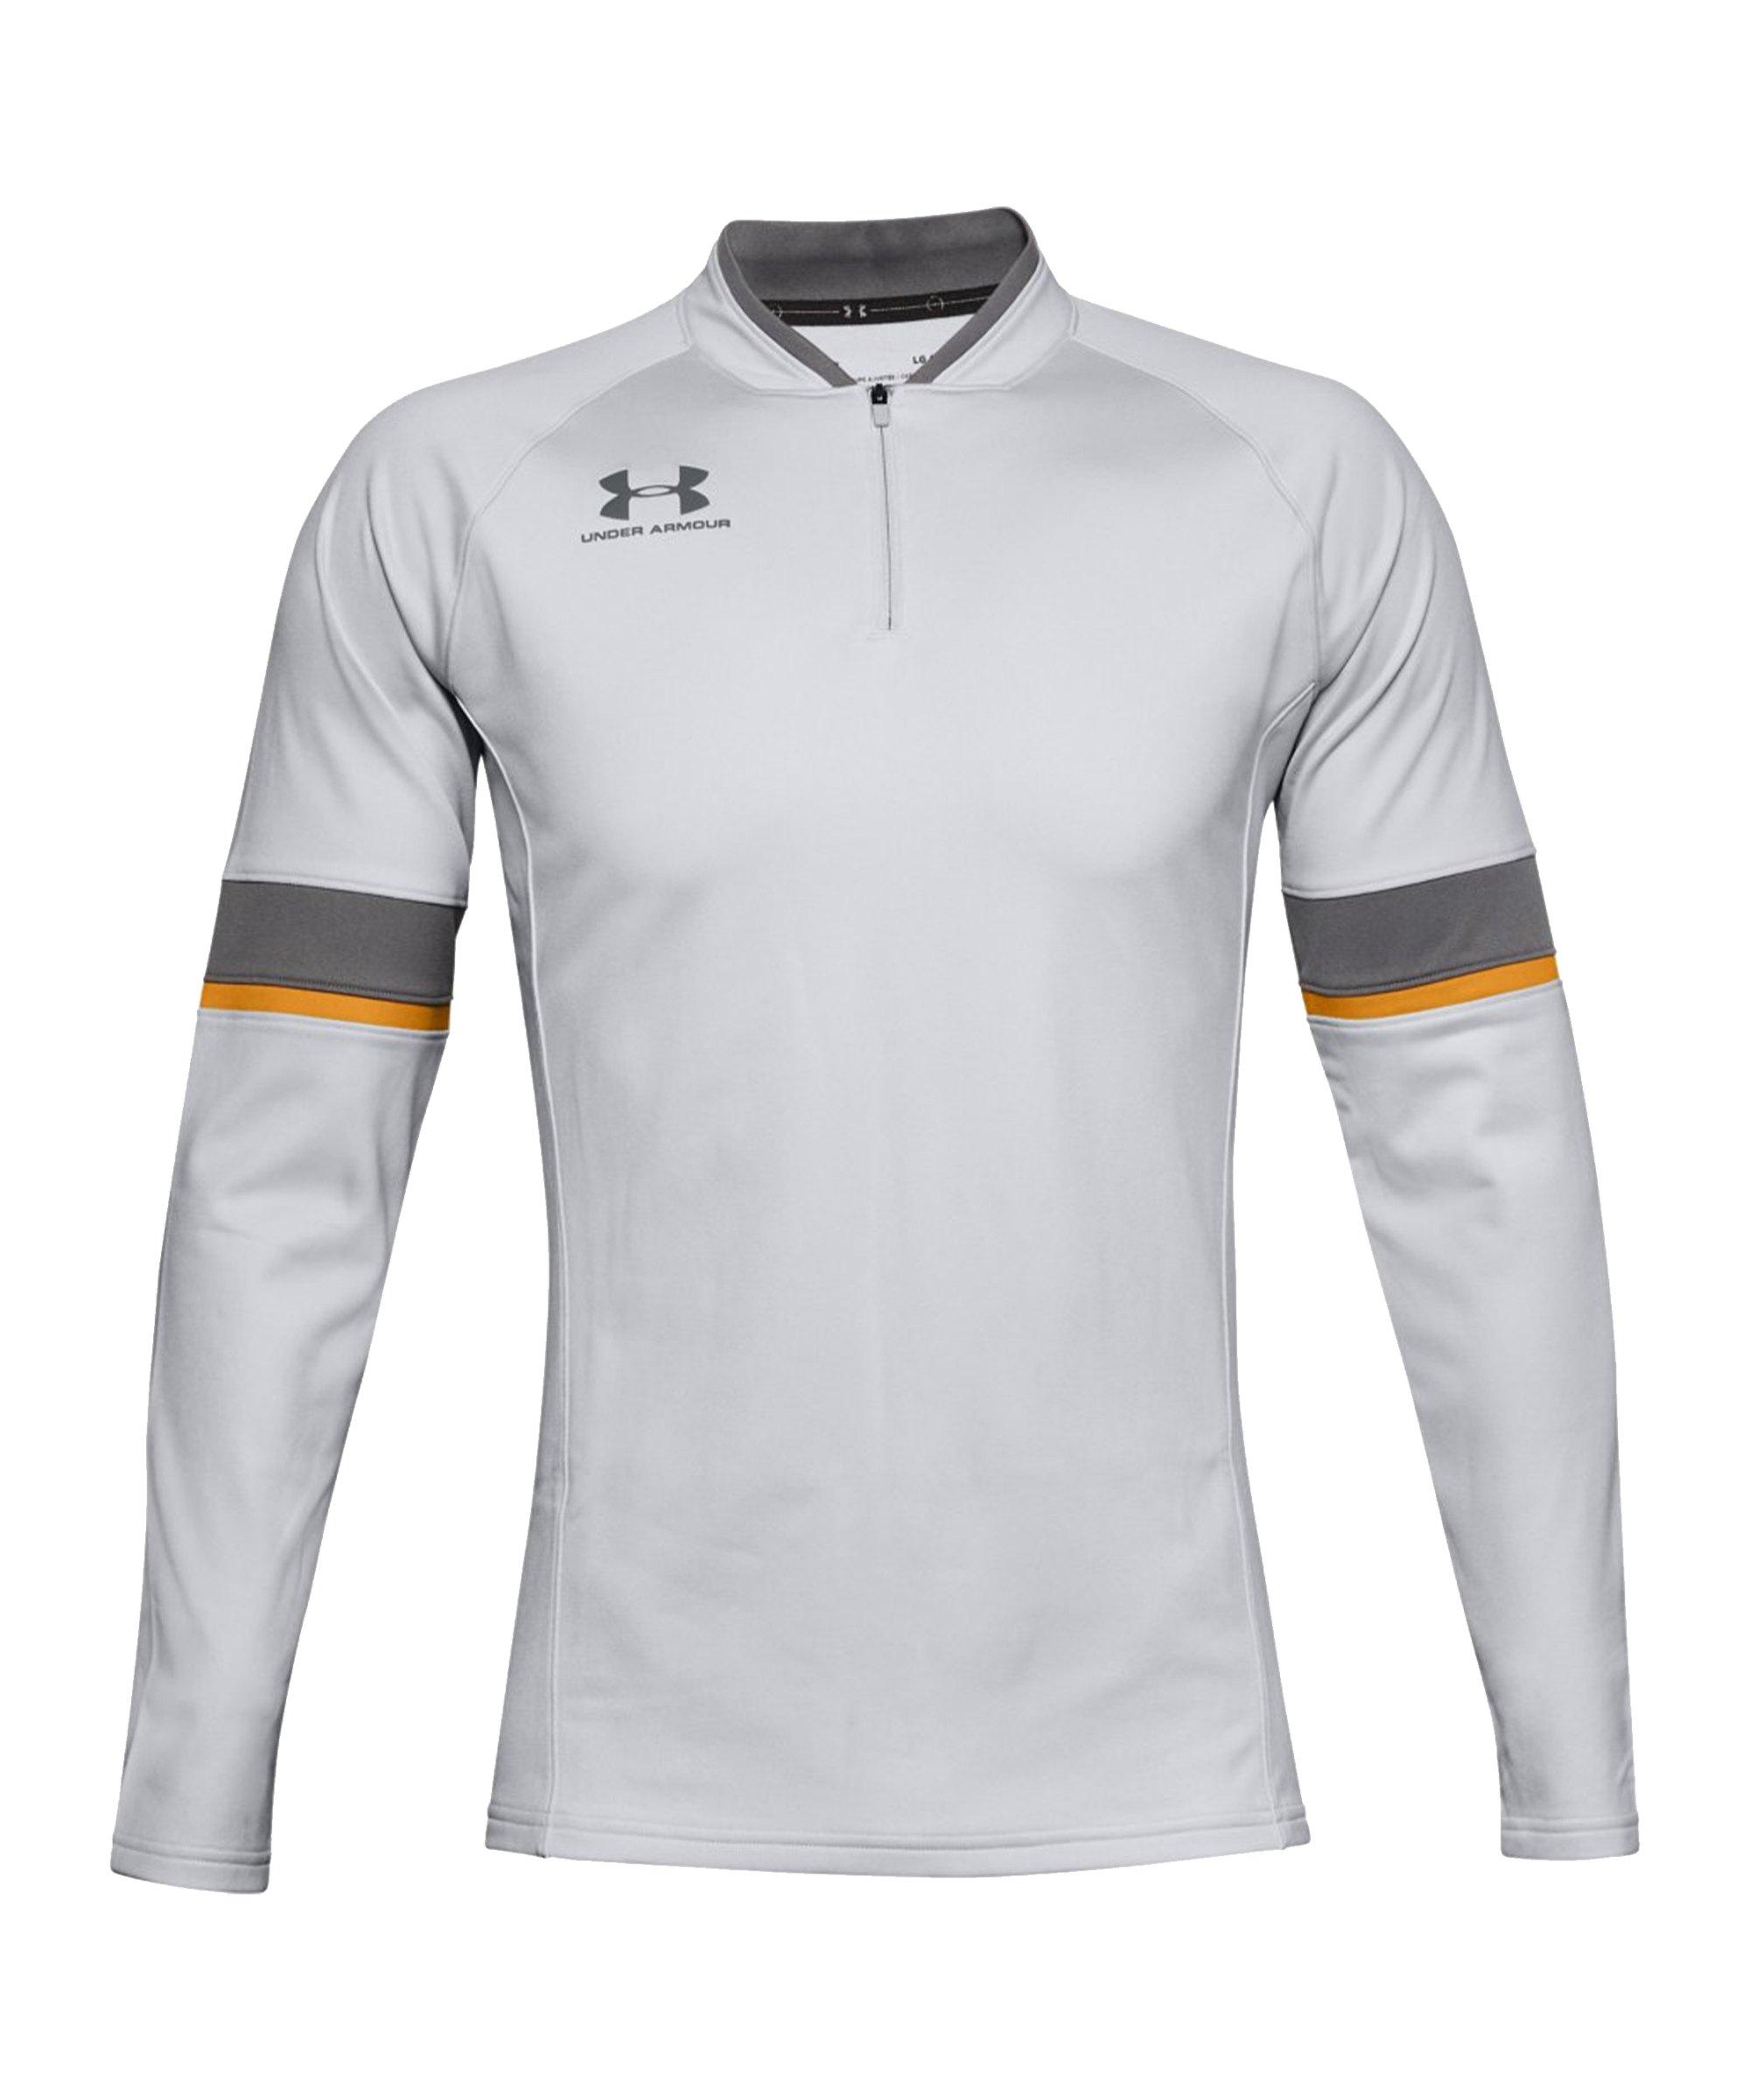 Under Armour Challenger III Sweatshirt F015 - grau